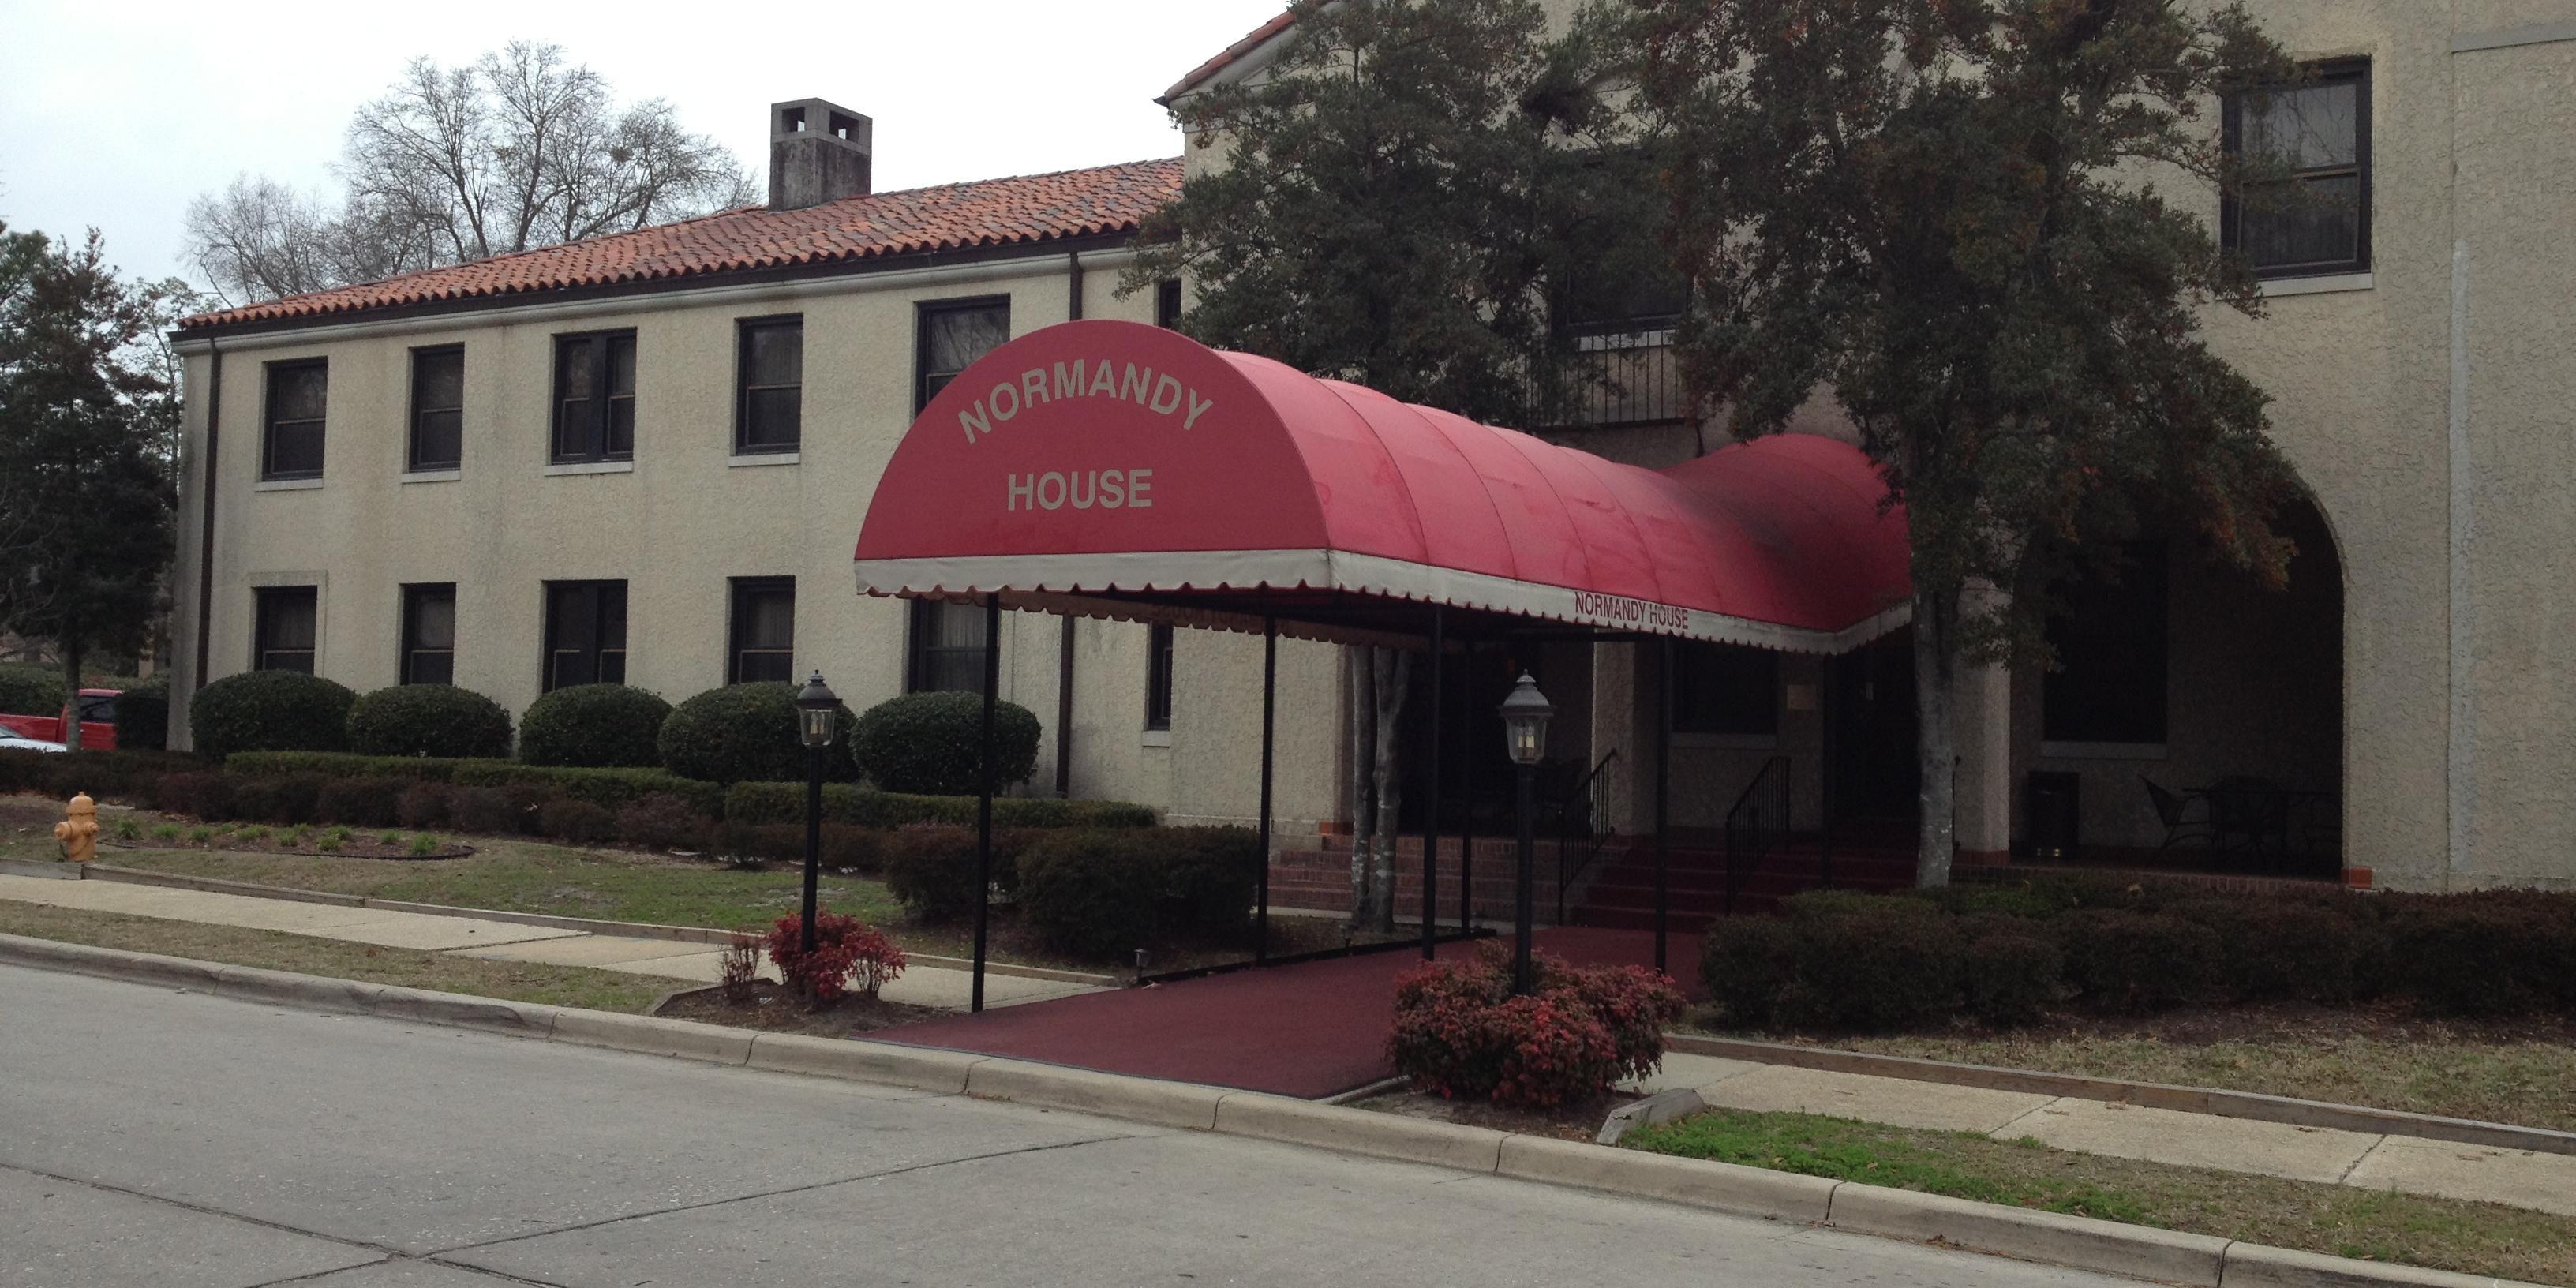 Ihg Army Hotels Normandy House Carolina Inn Map Driving Directions